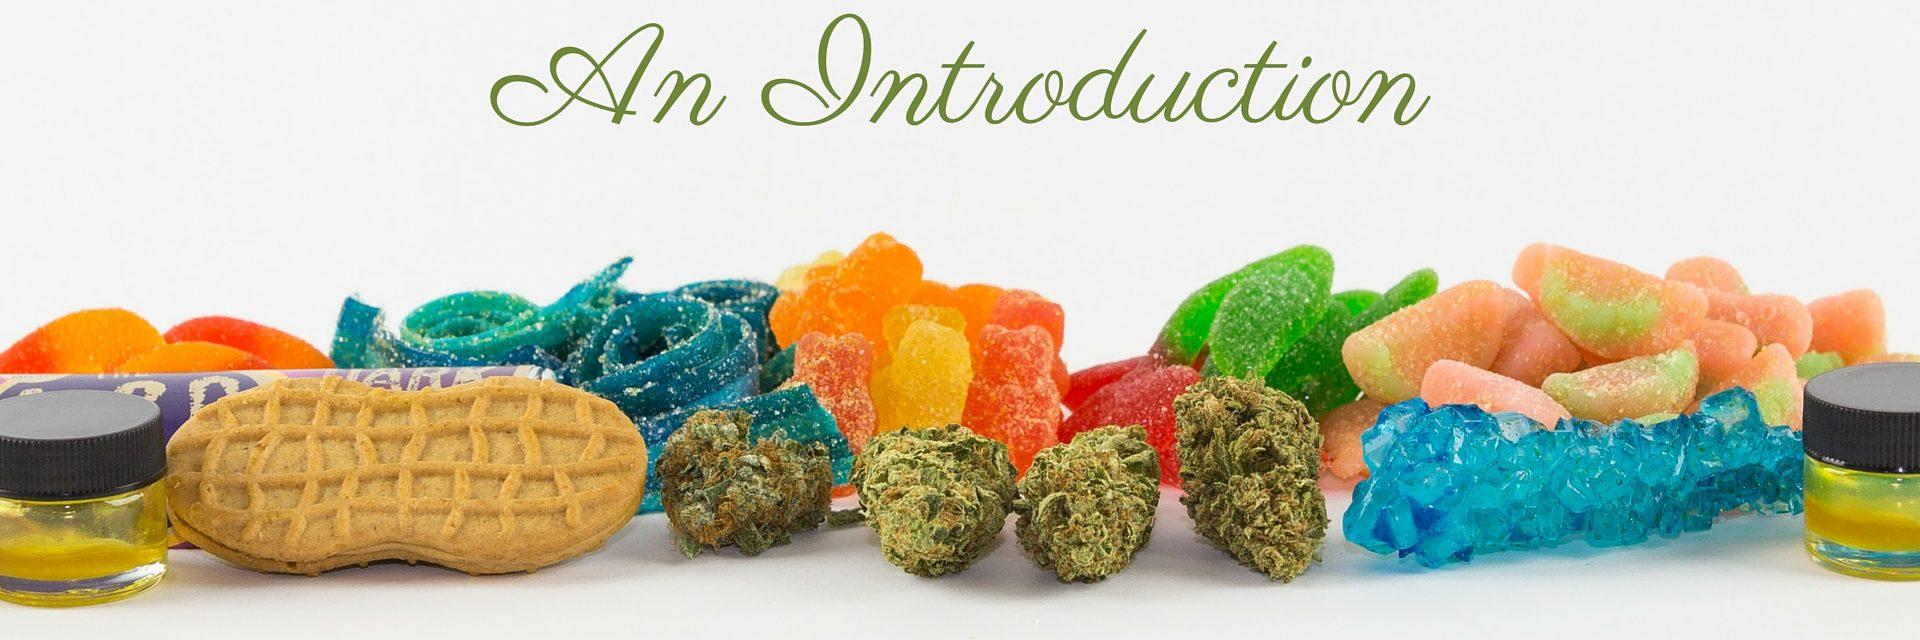 can-i-buy-marijuana-online-in-Australia